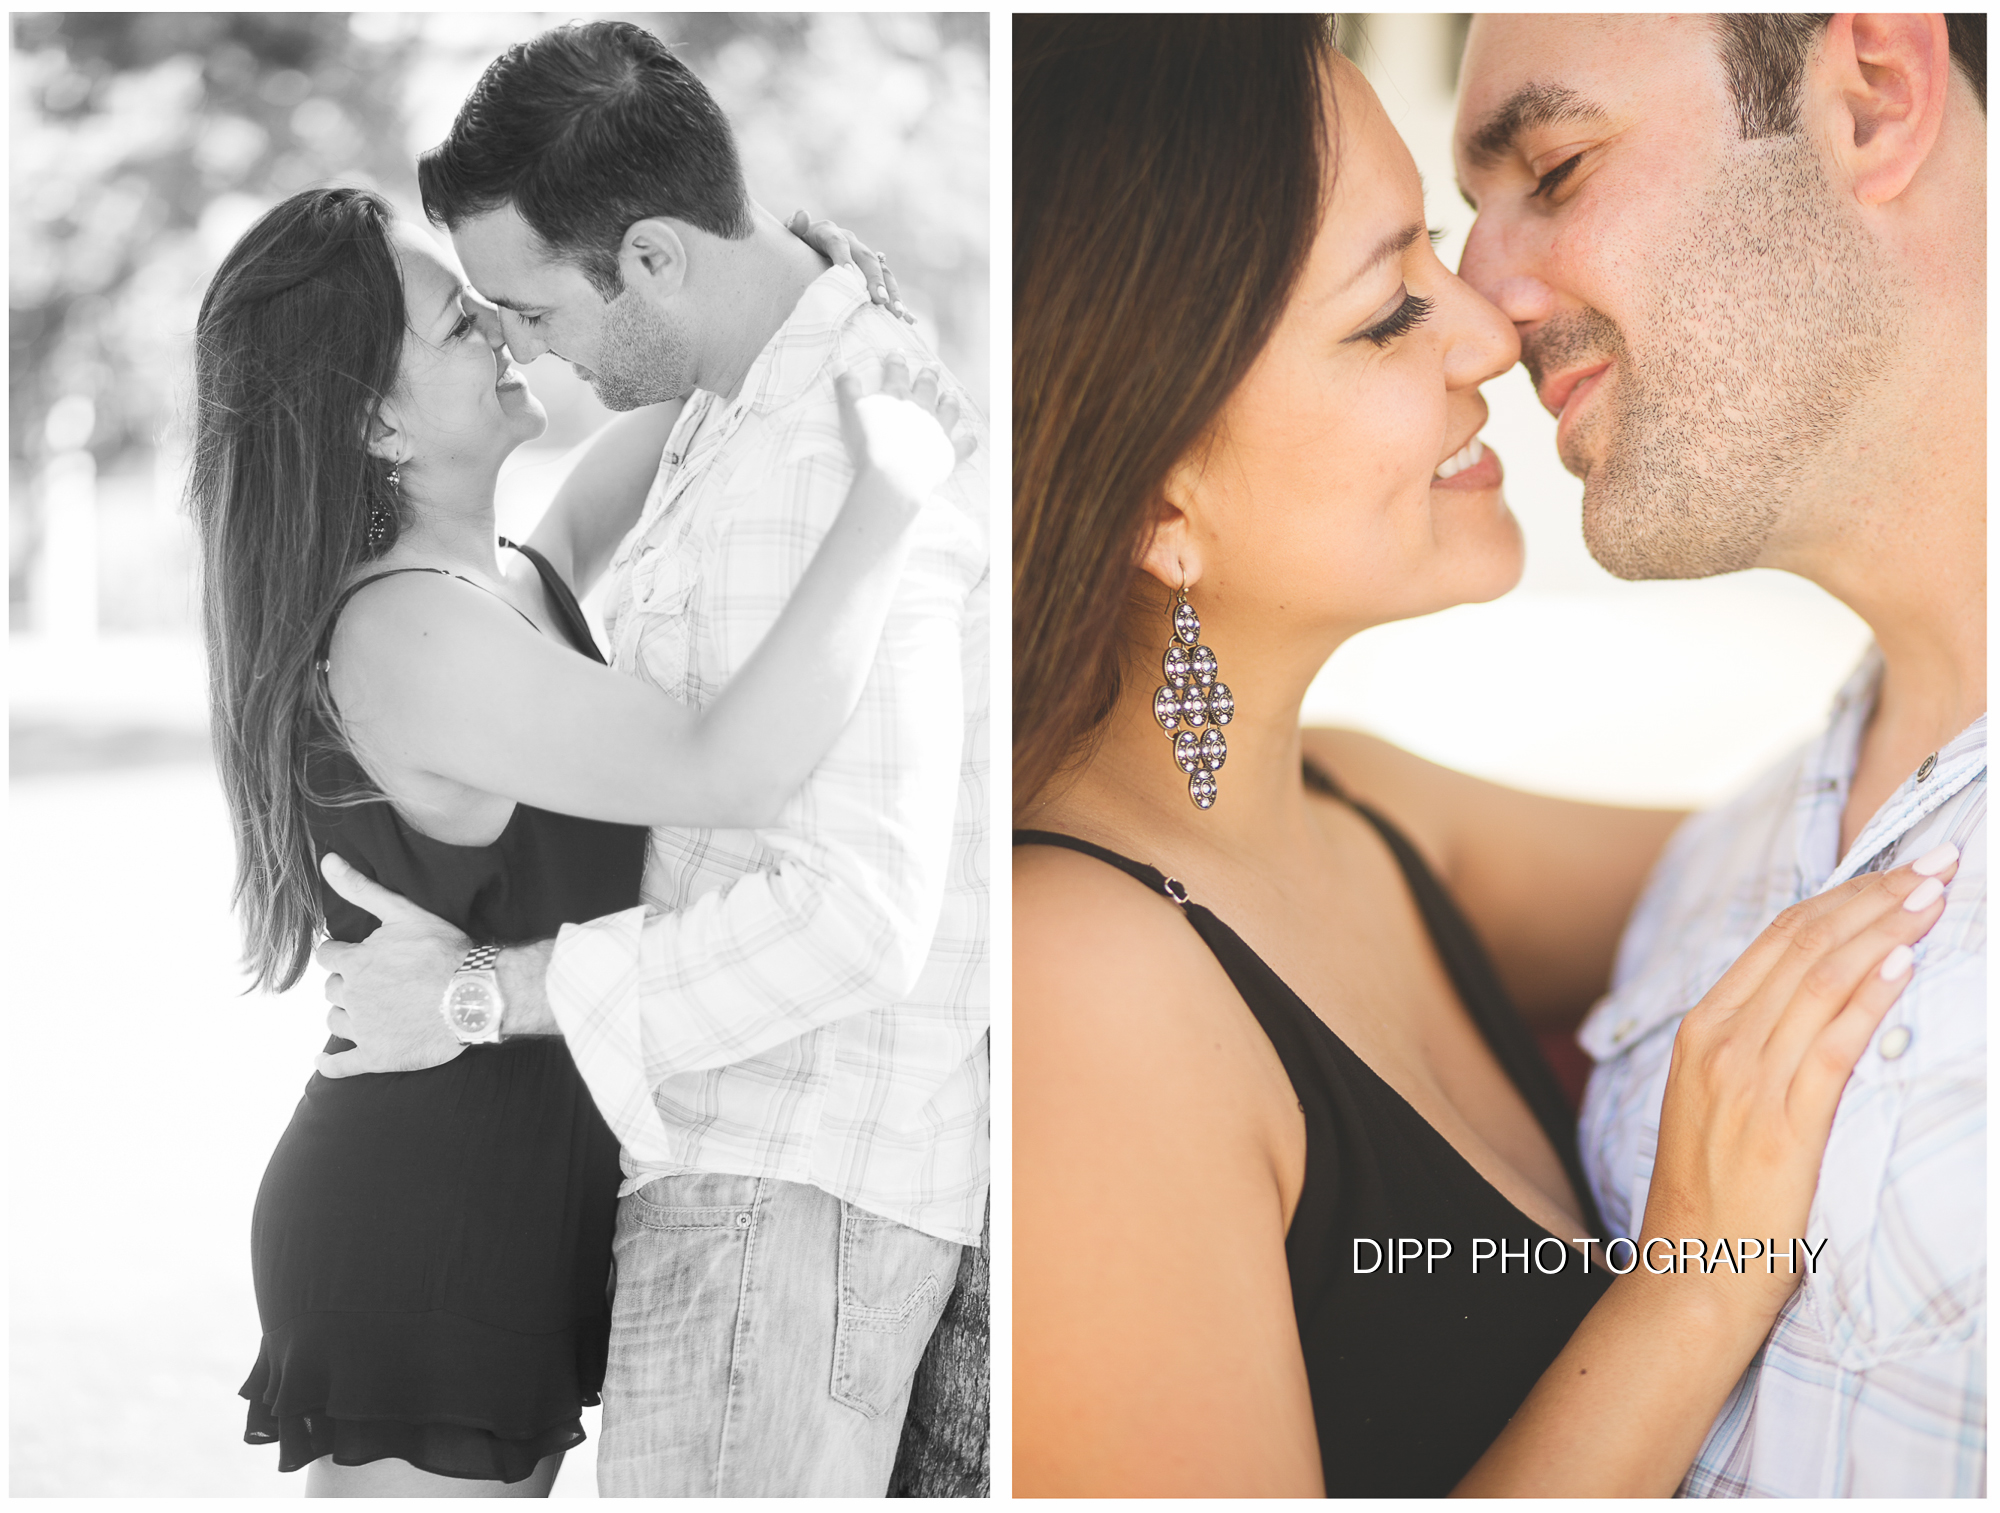 Dipp_2016 Brandon & Sara Mini Engagement Session-180-Edit222